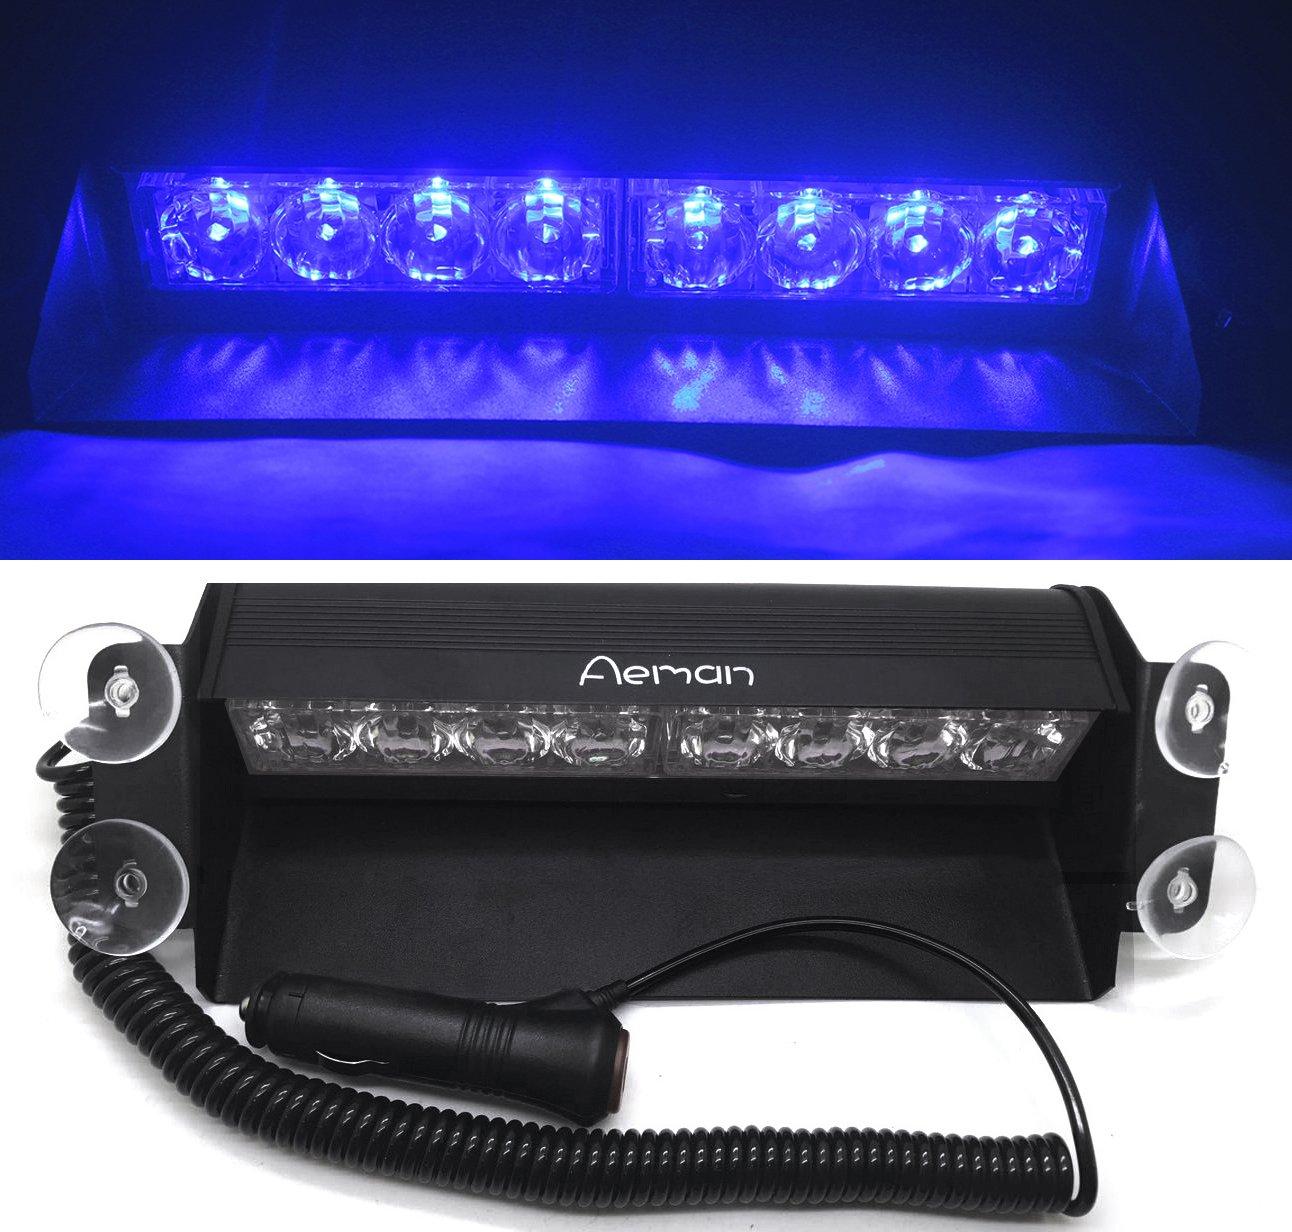 Aeman 12V 8 LED Advertencia Precaució n de emergencia Lá mpara de luces estroboscó picas para coche camió n el techo Interior Dash parabrisas con 4 ventosas - Azul